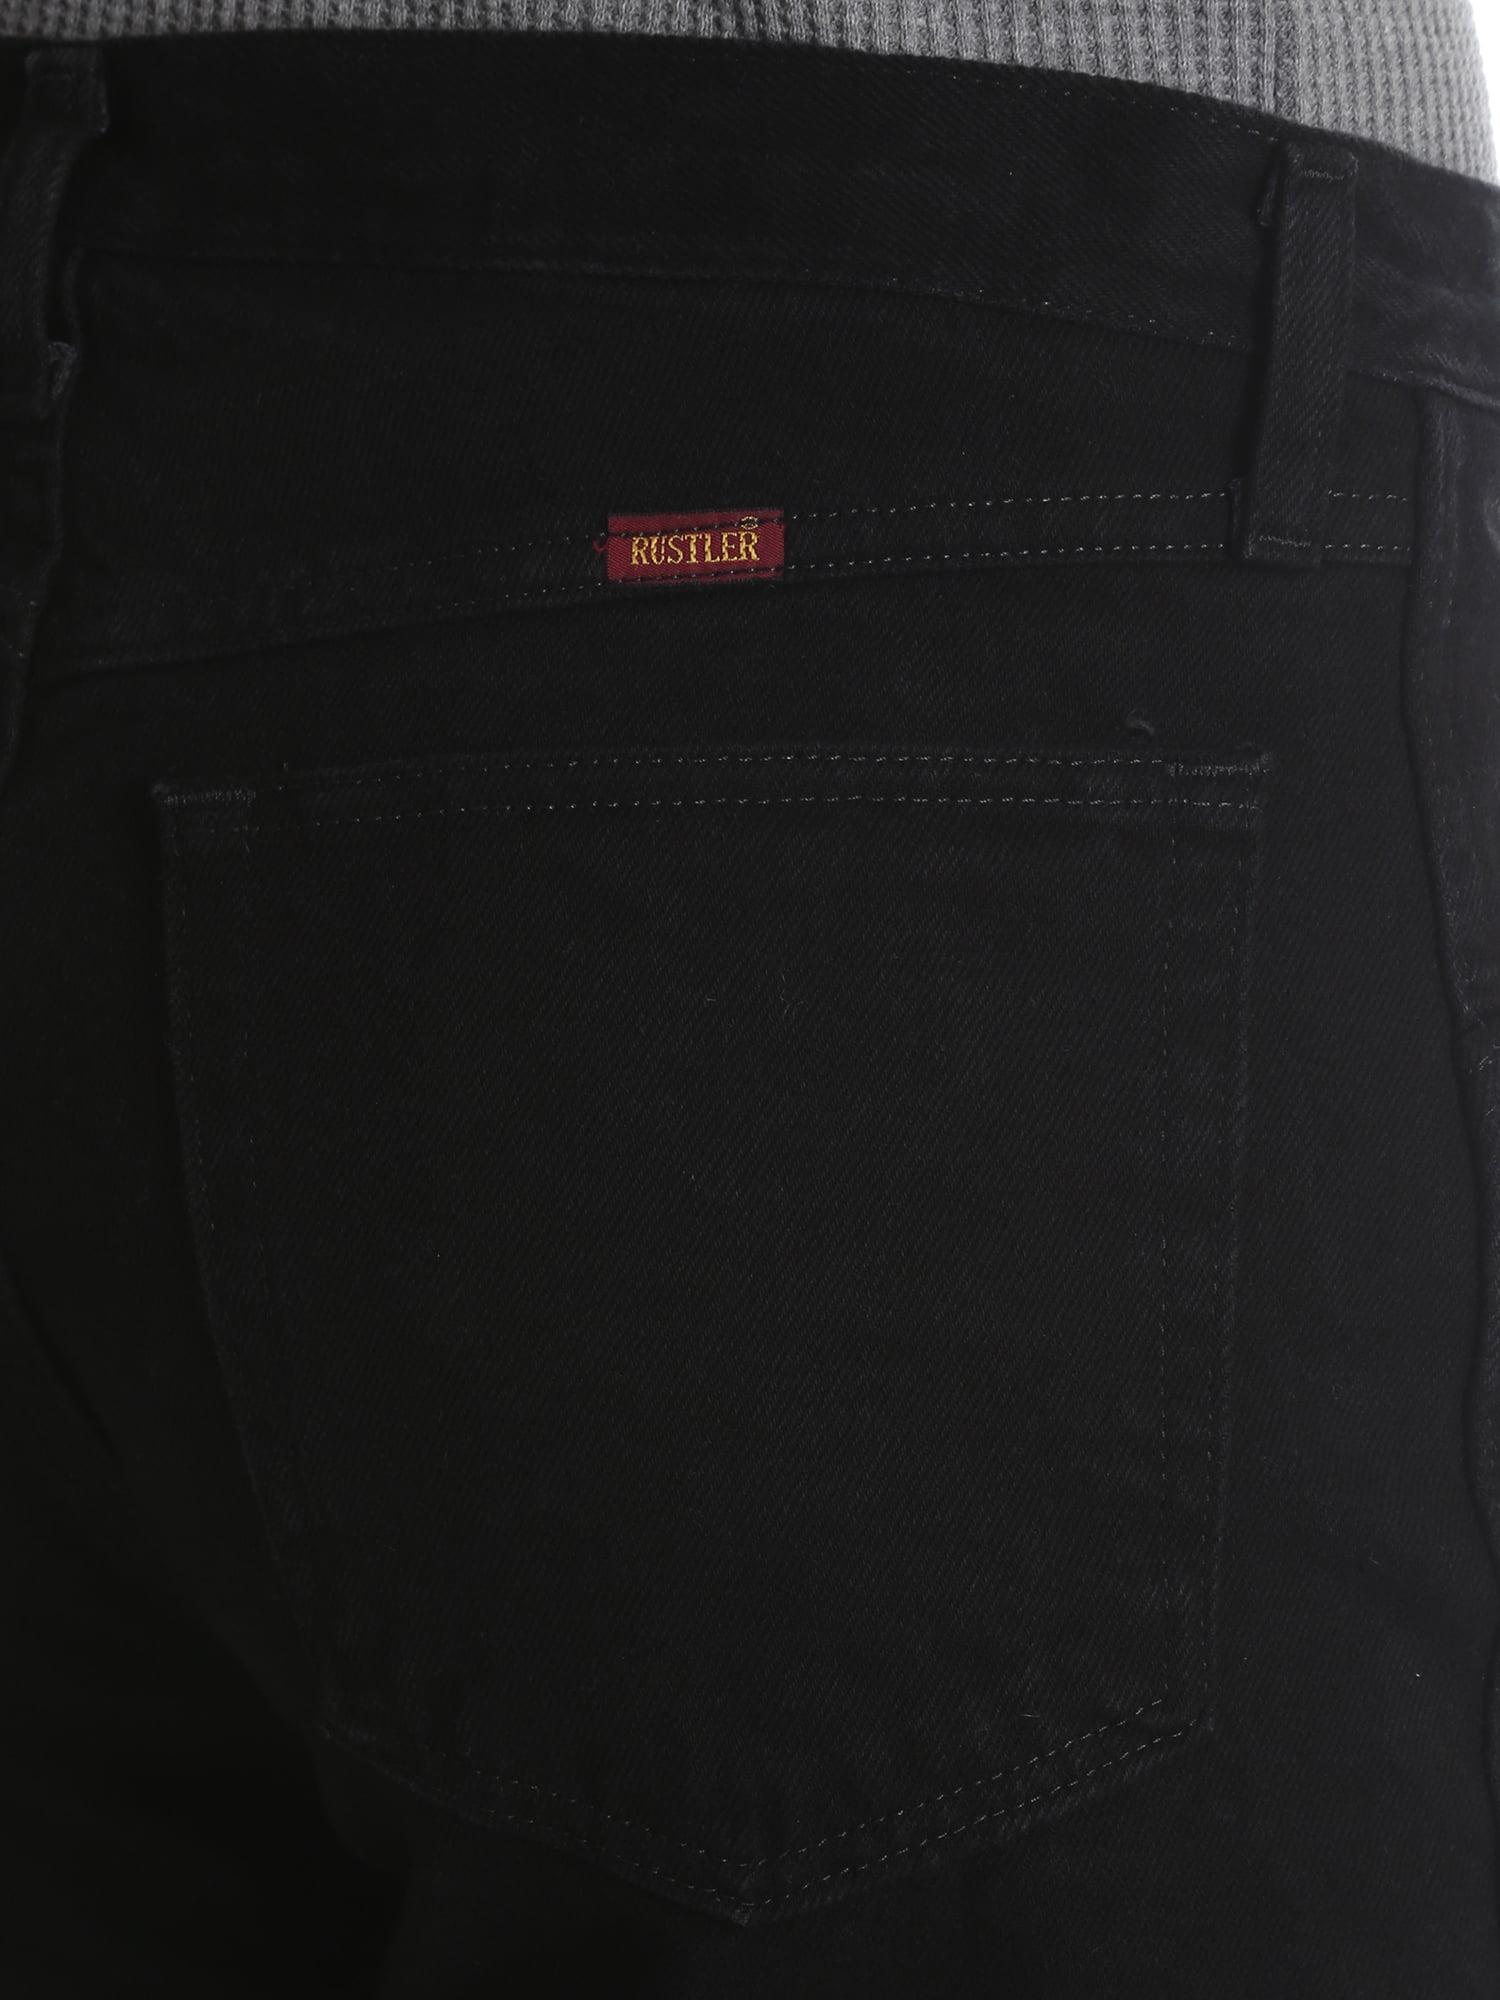 Rustler Rustler Men S And Big Men S Regular Fit Jeans Walmart Com Walmart Com